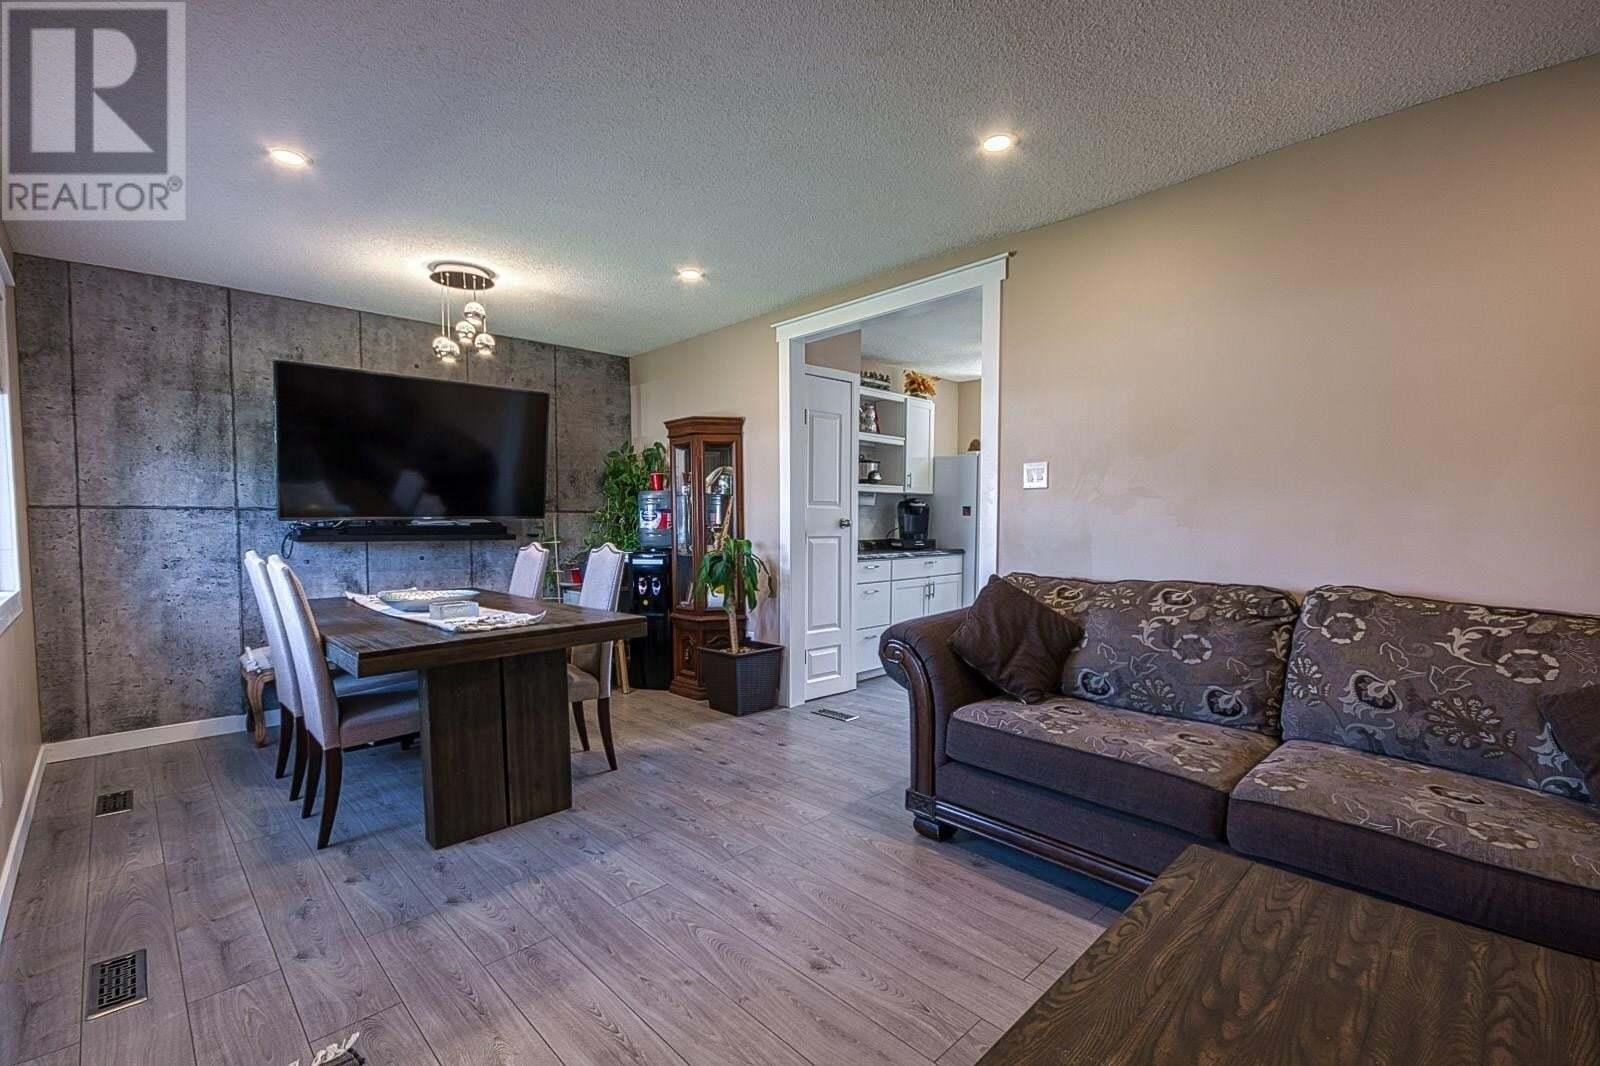 House for sale at 349 Mcintosh St N Regina Saskatchewan - MLS: SK826285